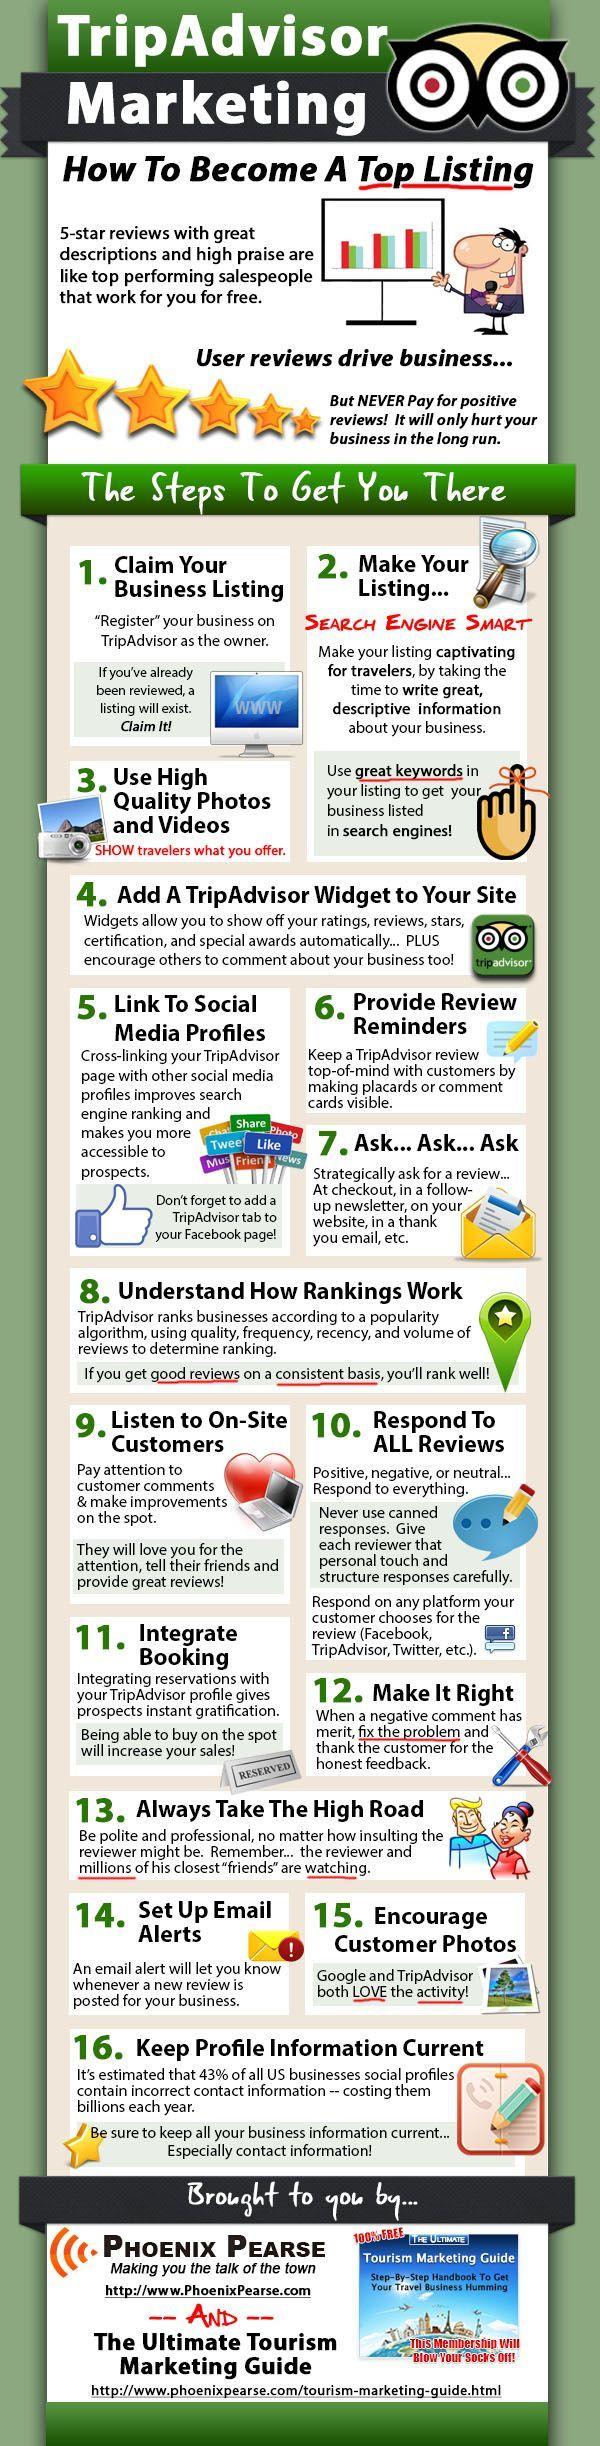 TripAdvisor marketing infographic: